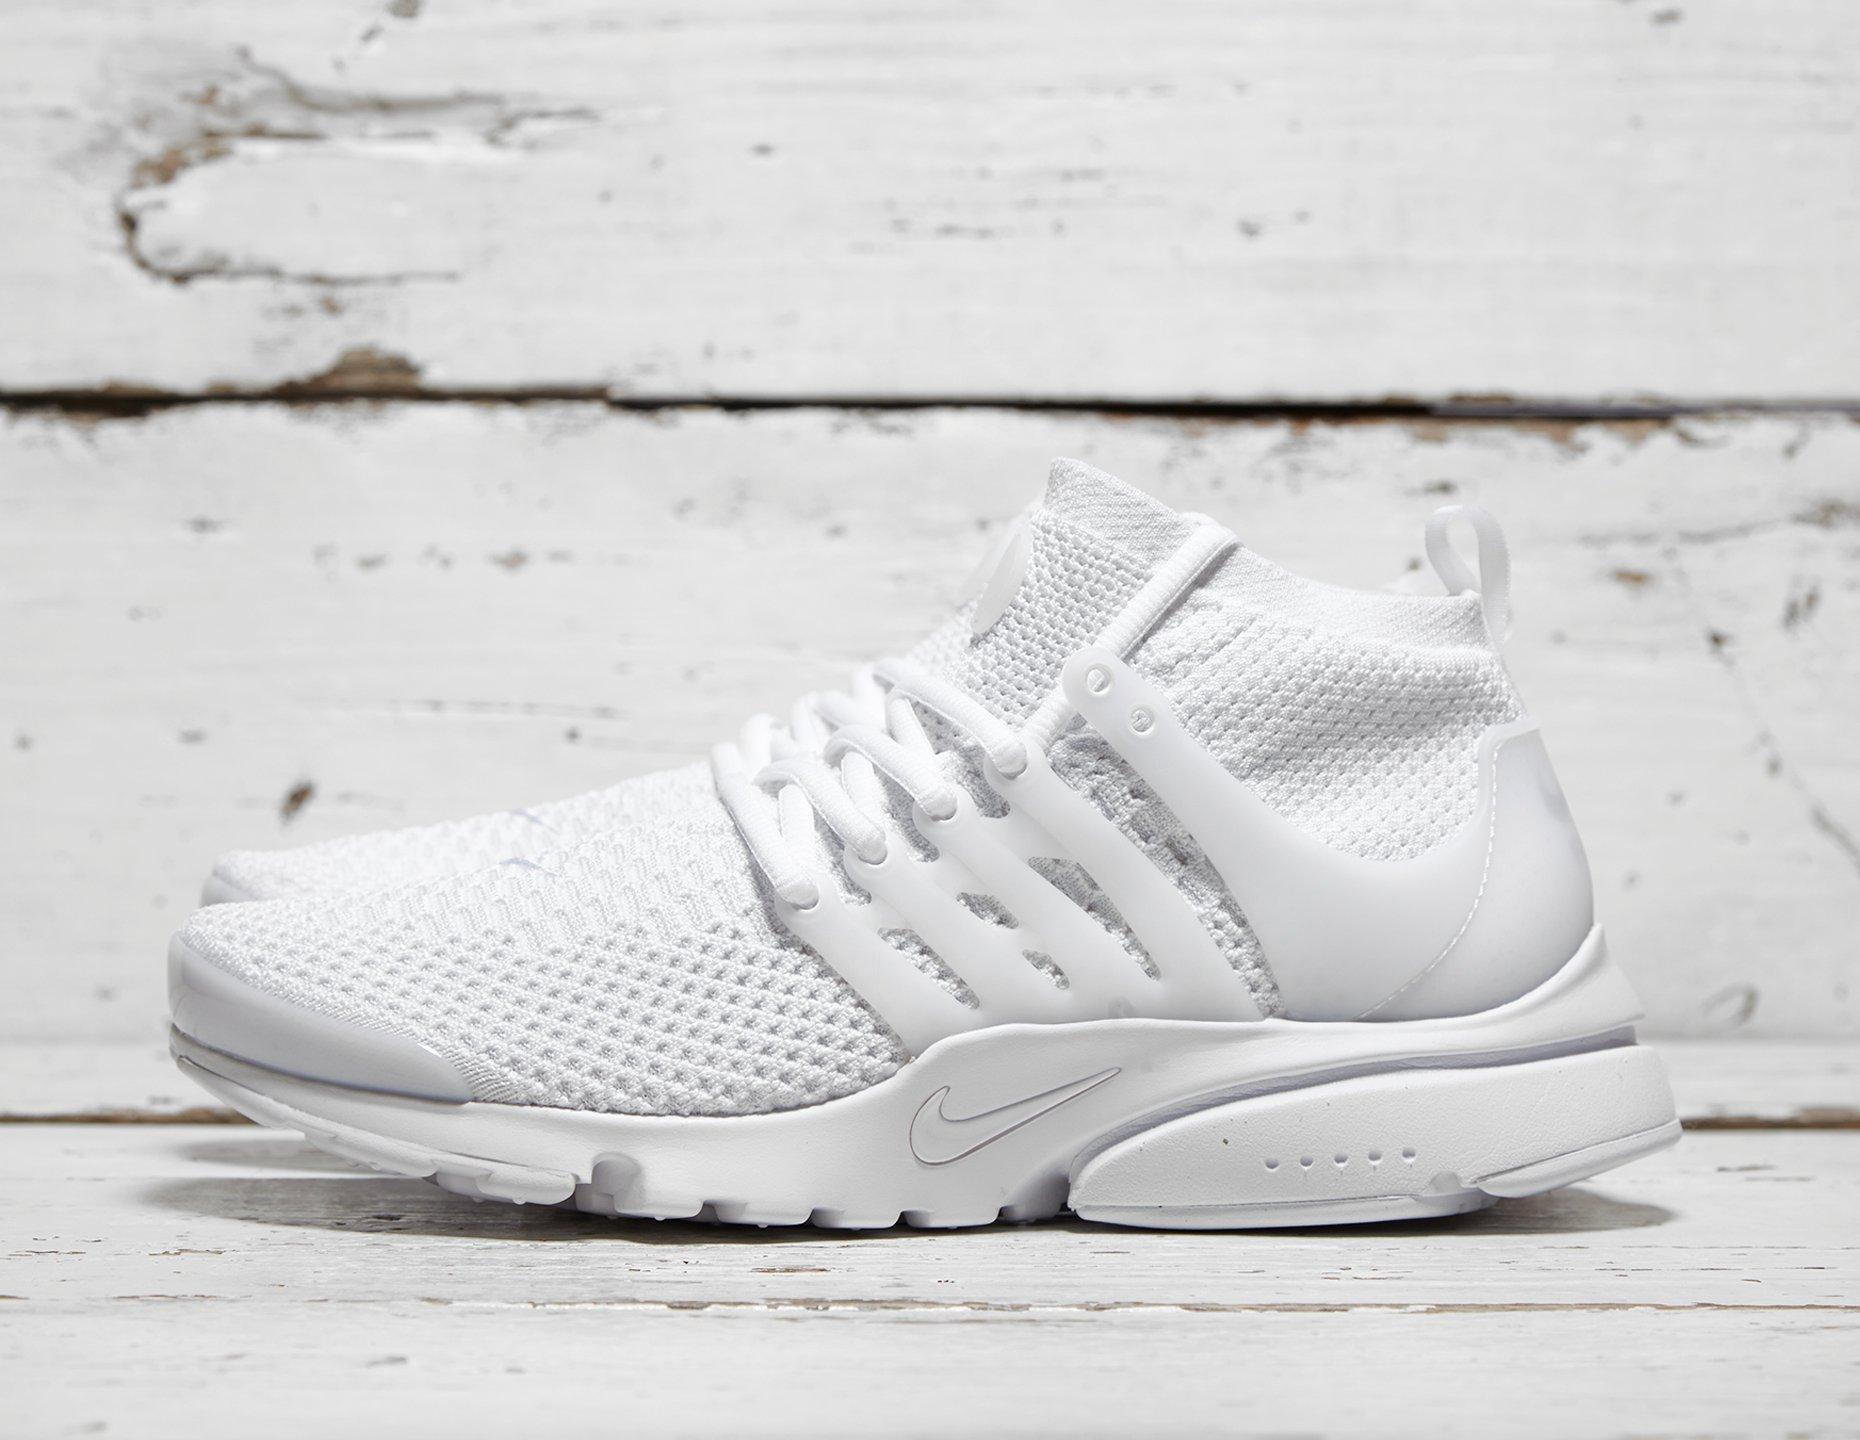 Mens Nike Air Presto Ultra Flyknit - White, White - photo 1/1